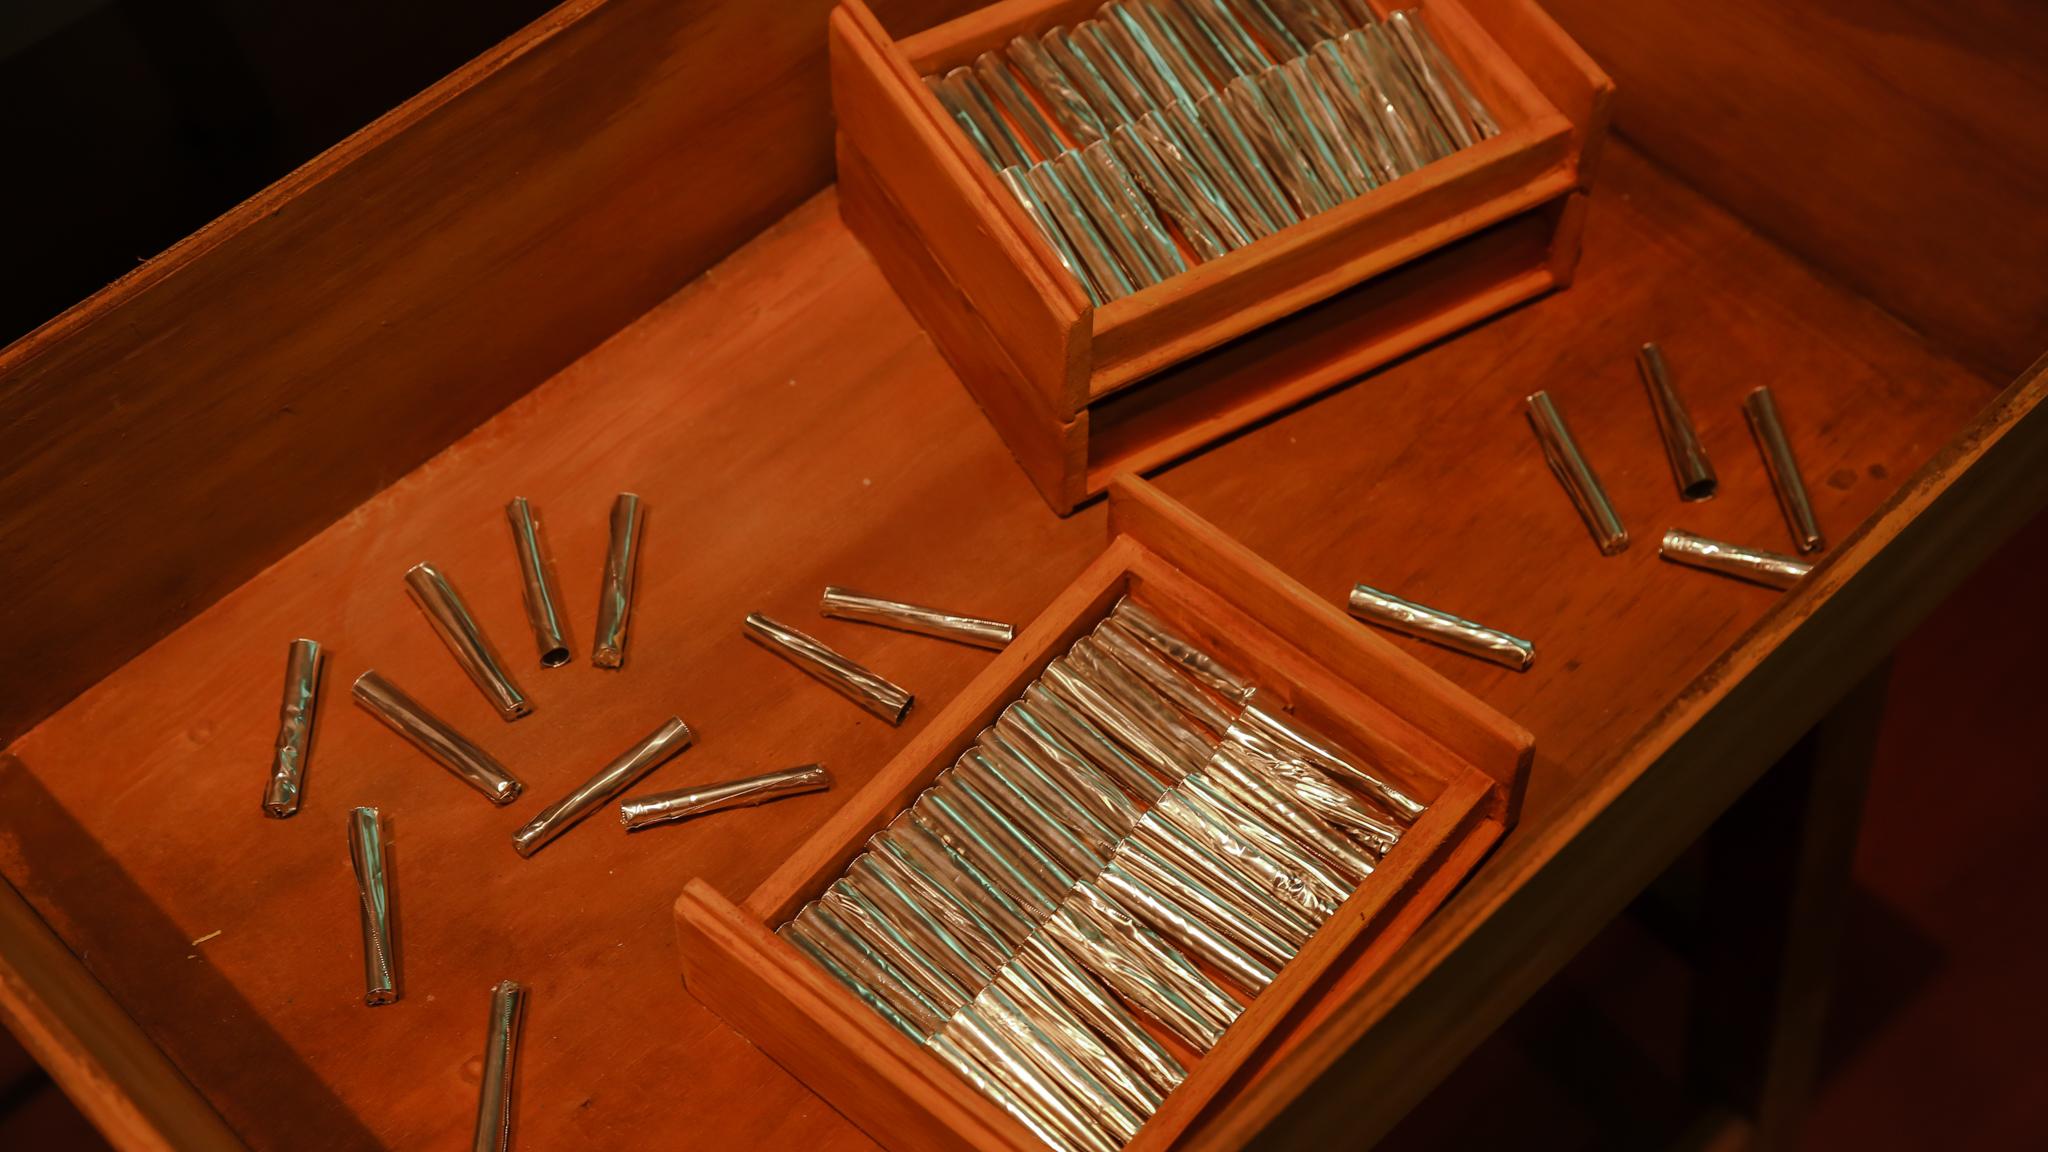 opium-metal-pipes-reflections-at-bukit-chandu